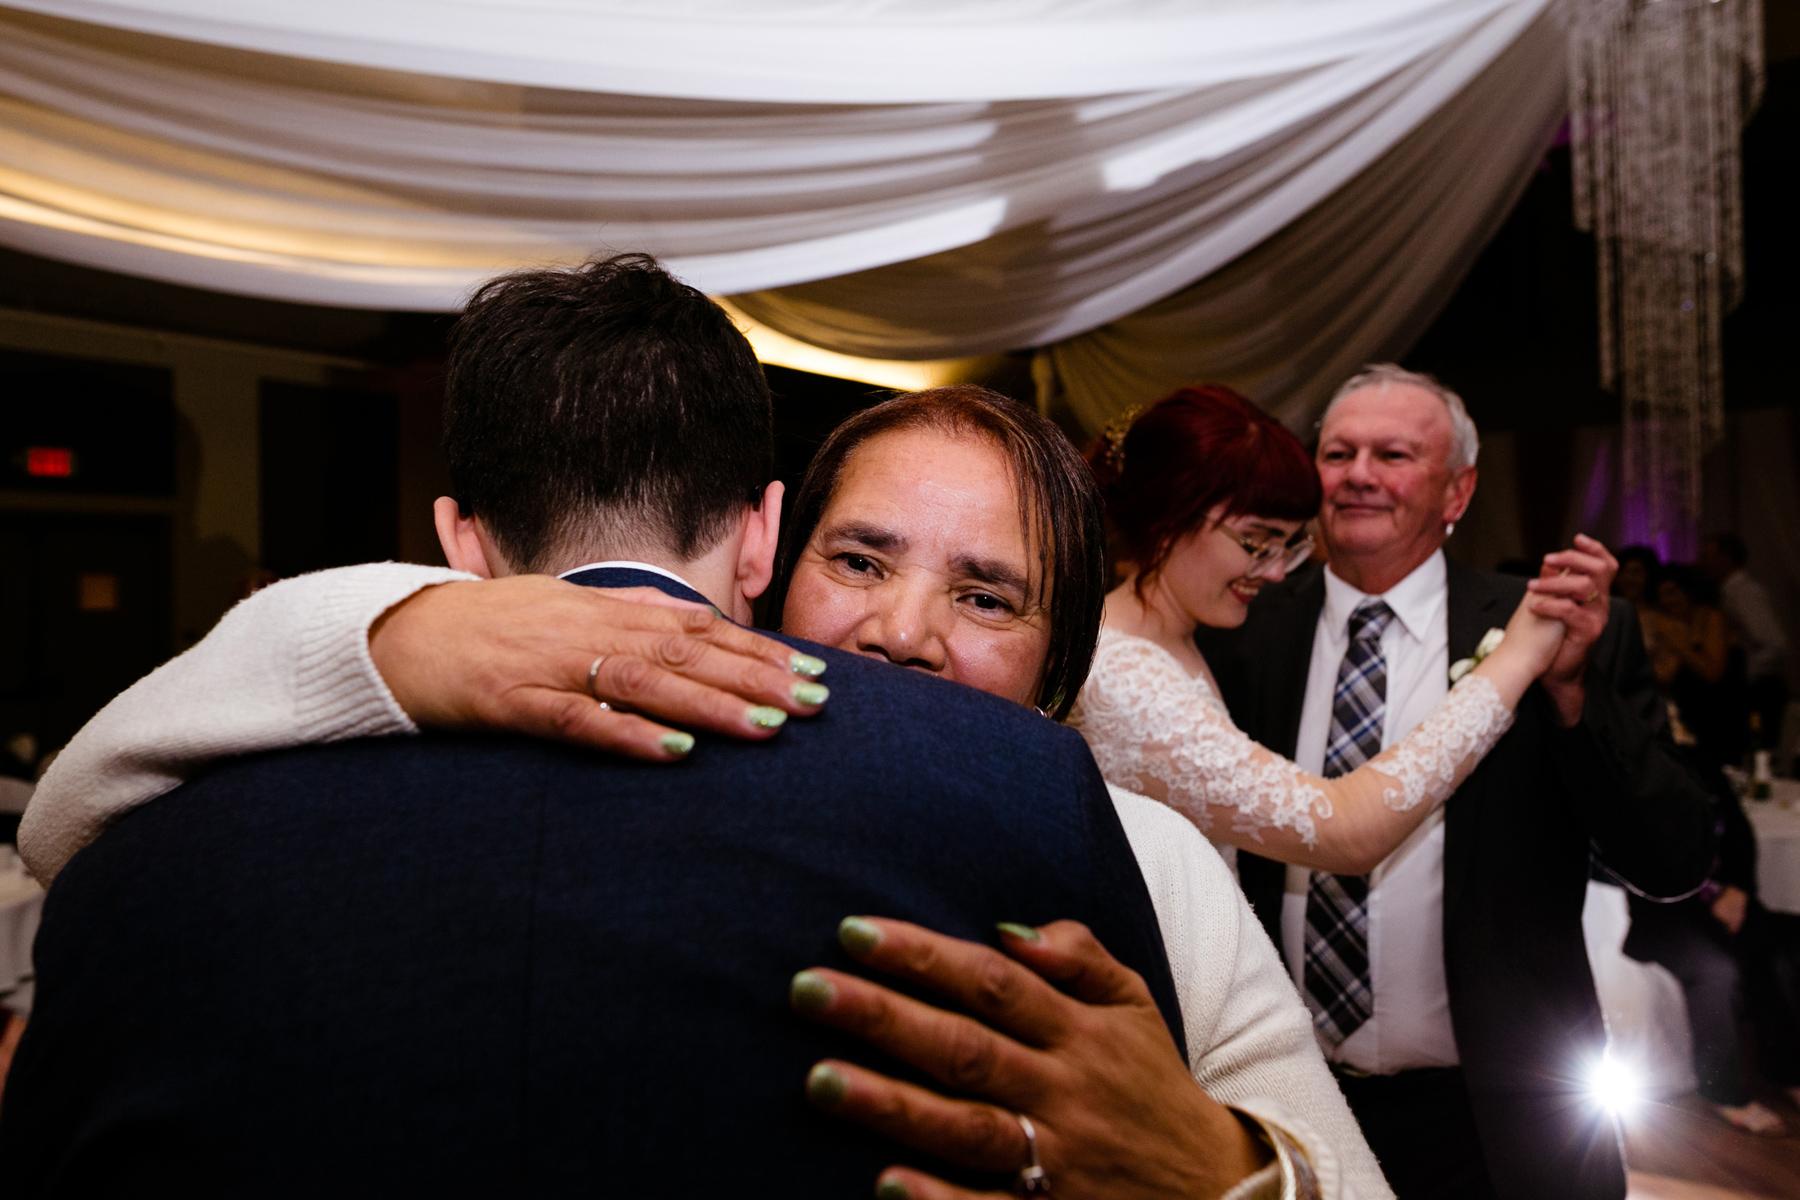 068-fredericton-wedding-photographer-kandisebrown-em2017